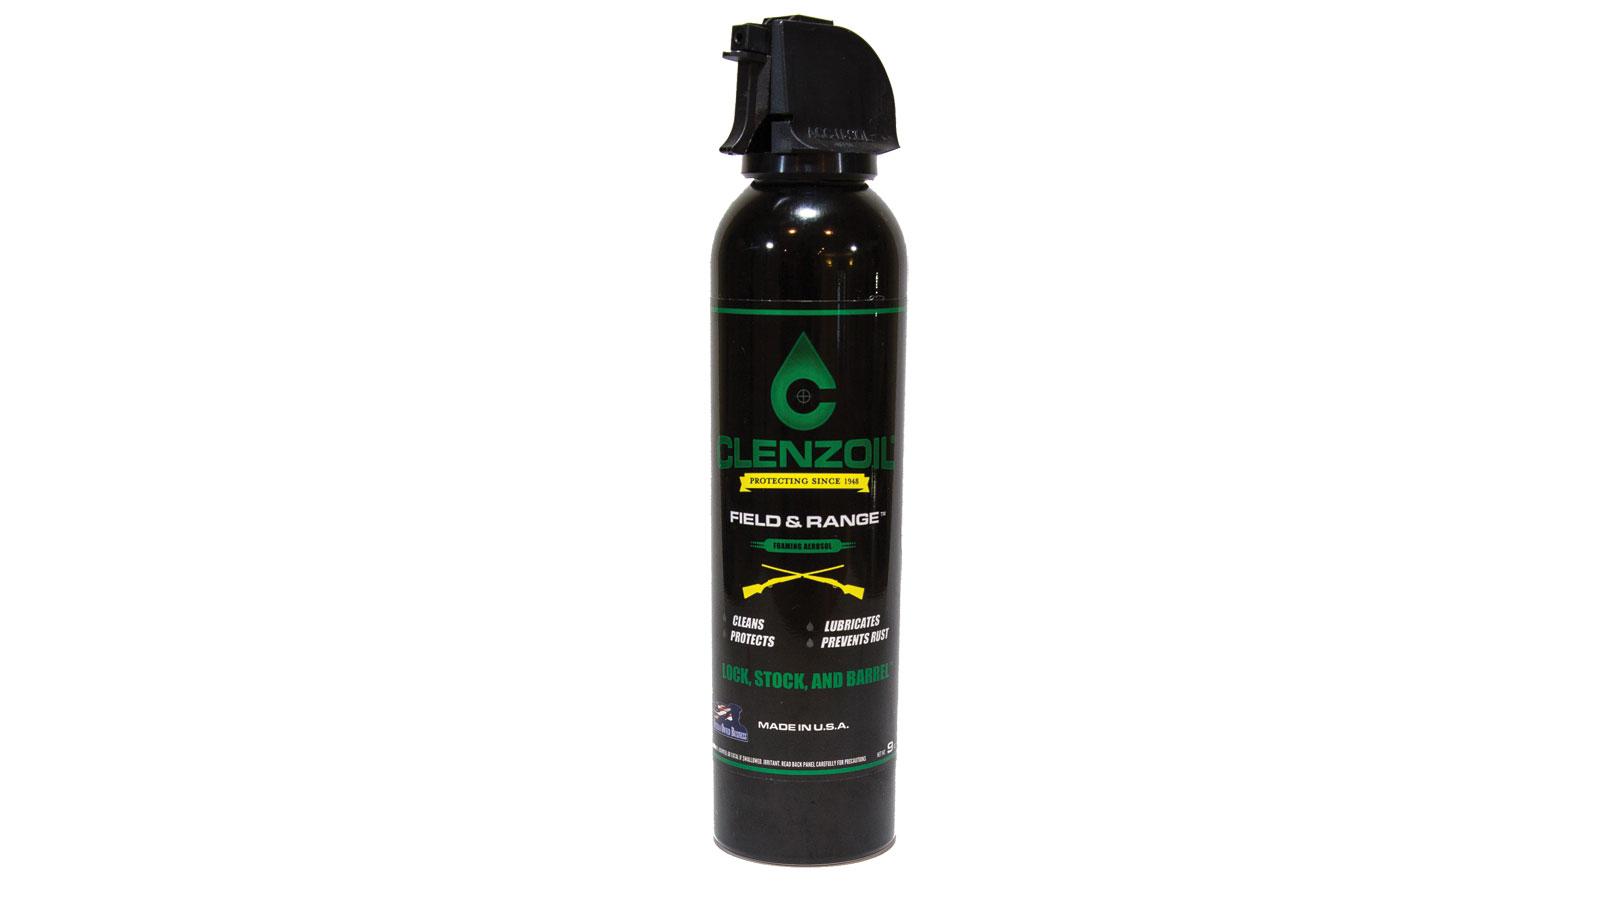 Clenzoil 2380 Field & Range Foaming Aerosol Cleaner|Lubricant|Protector 9 oz